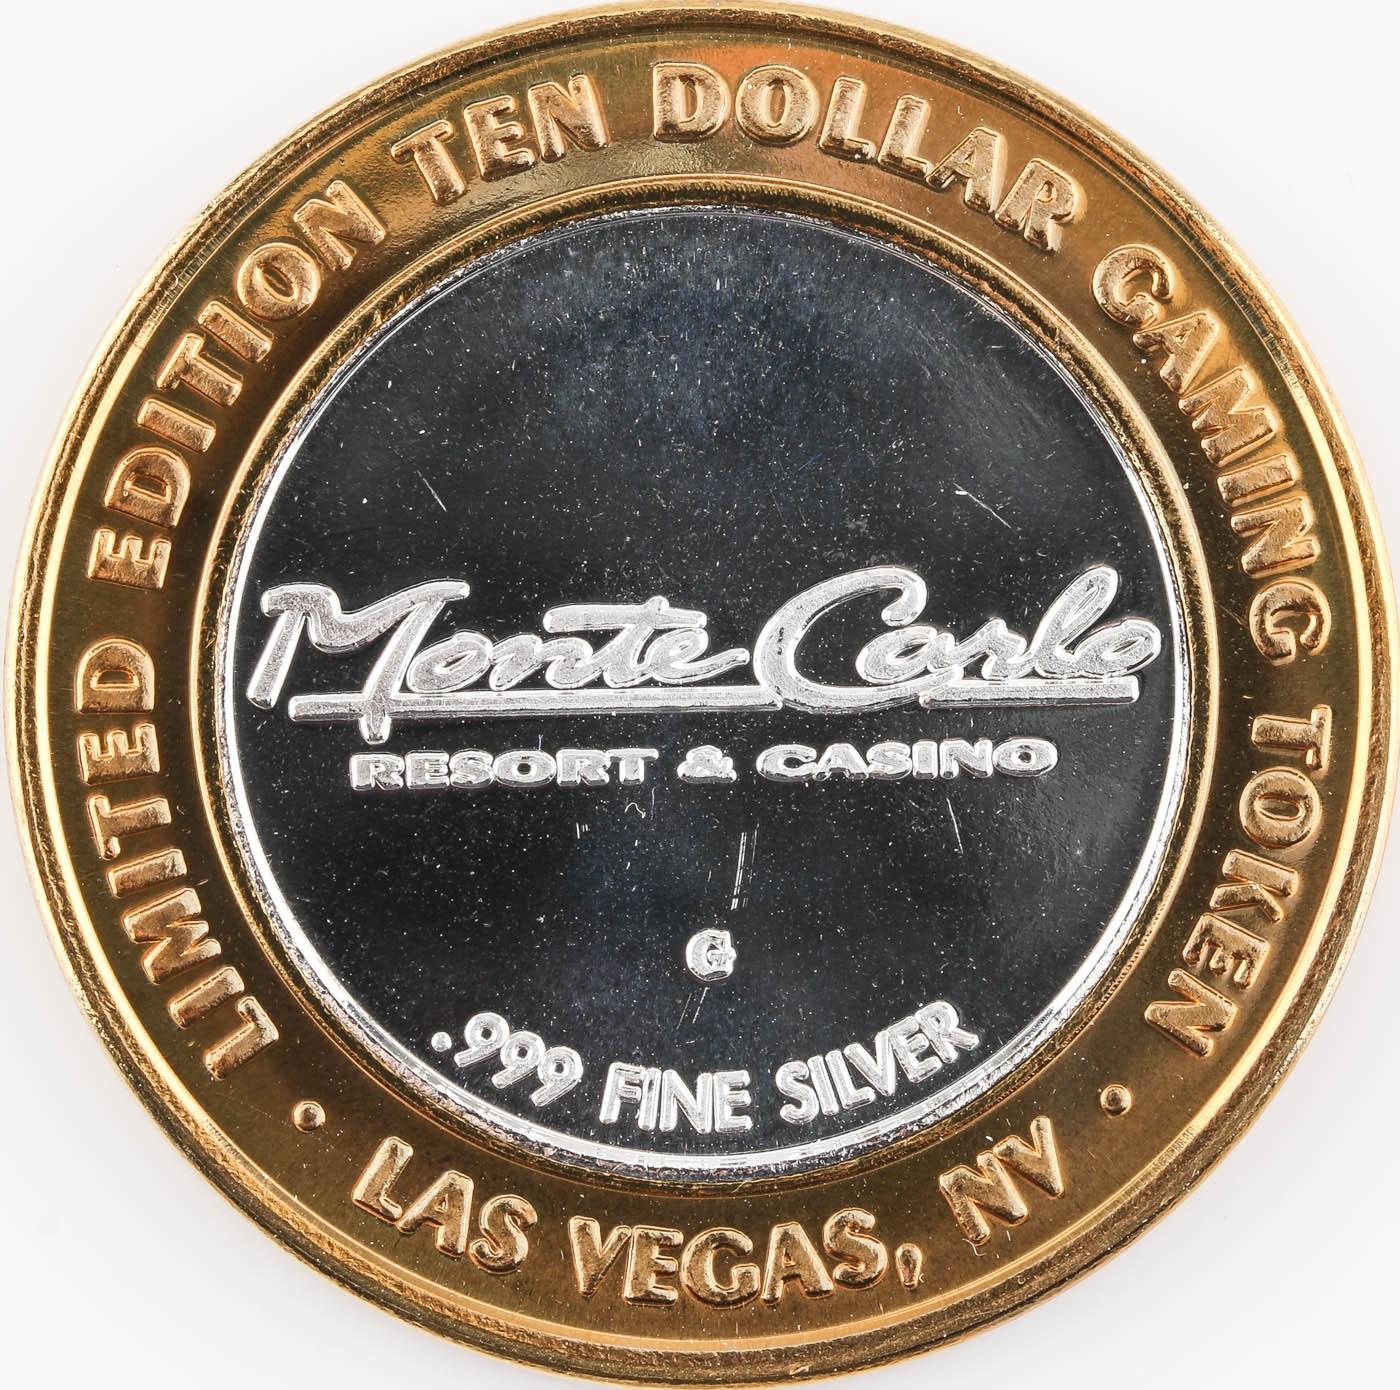 Vegas slots 777